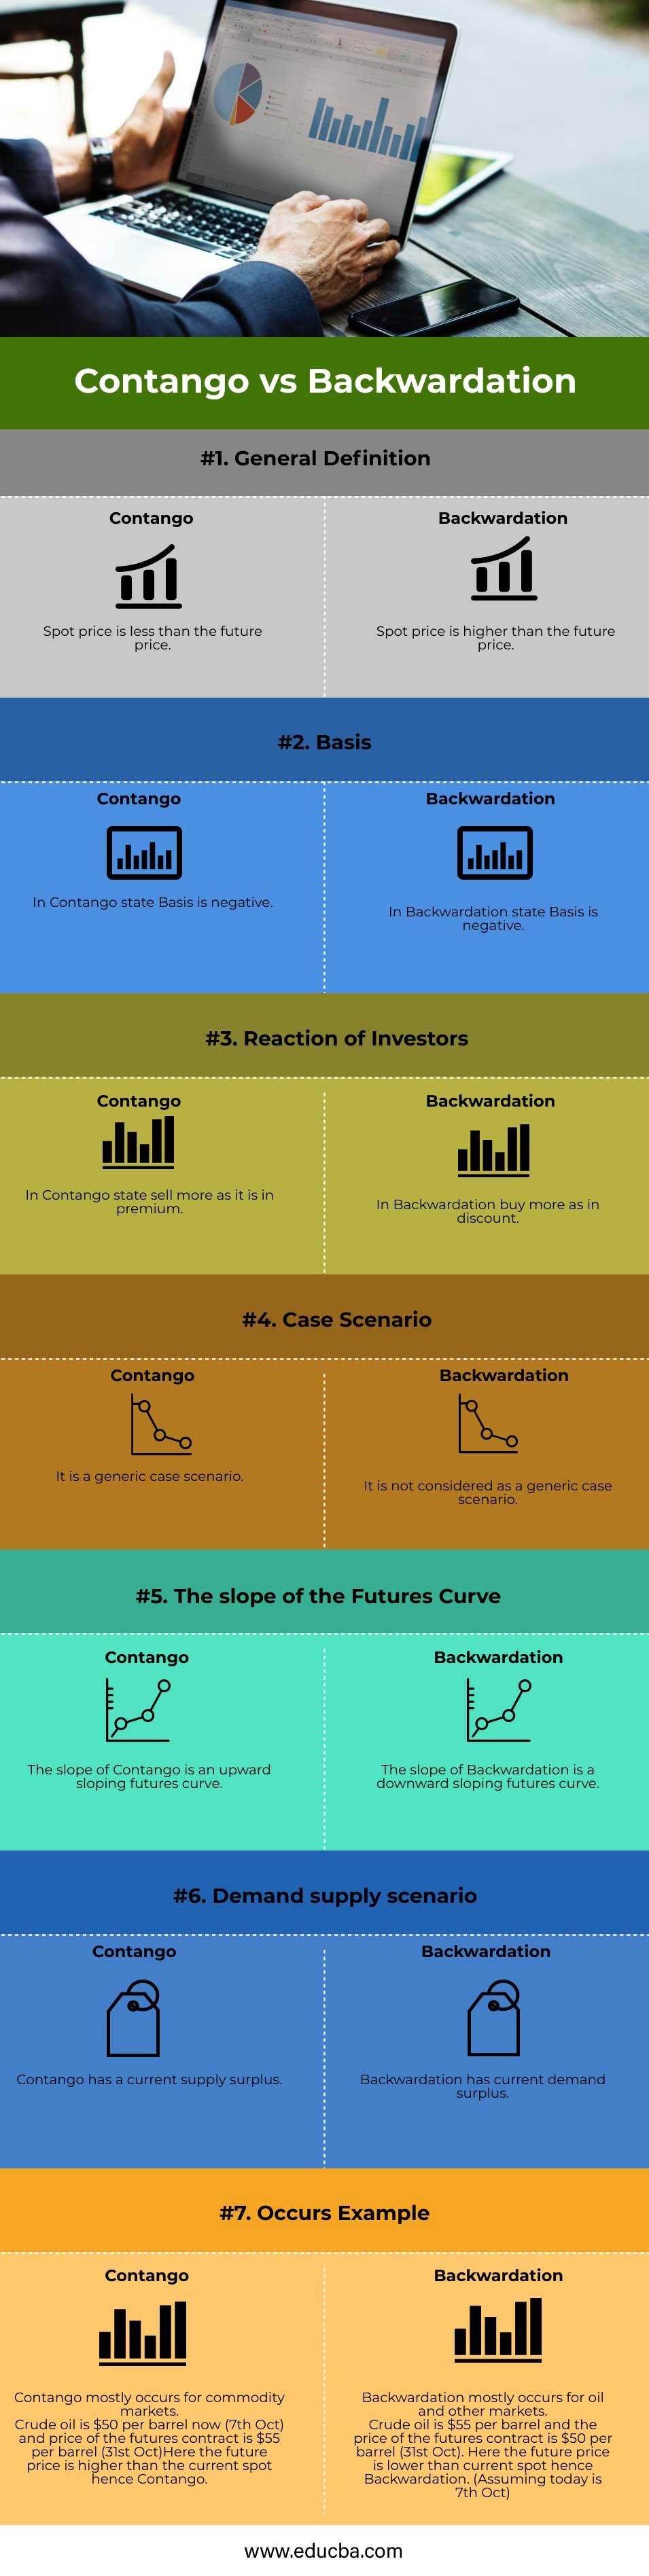 Contango-vs-Backwardation-info